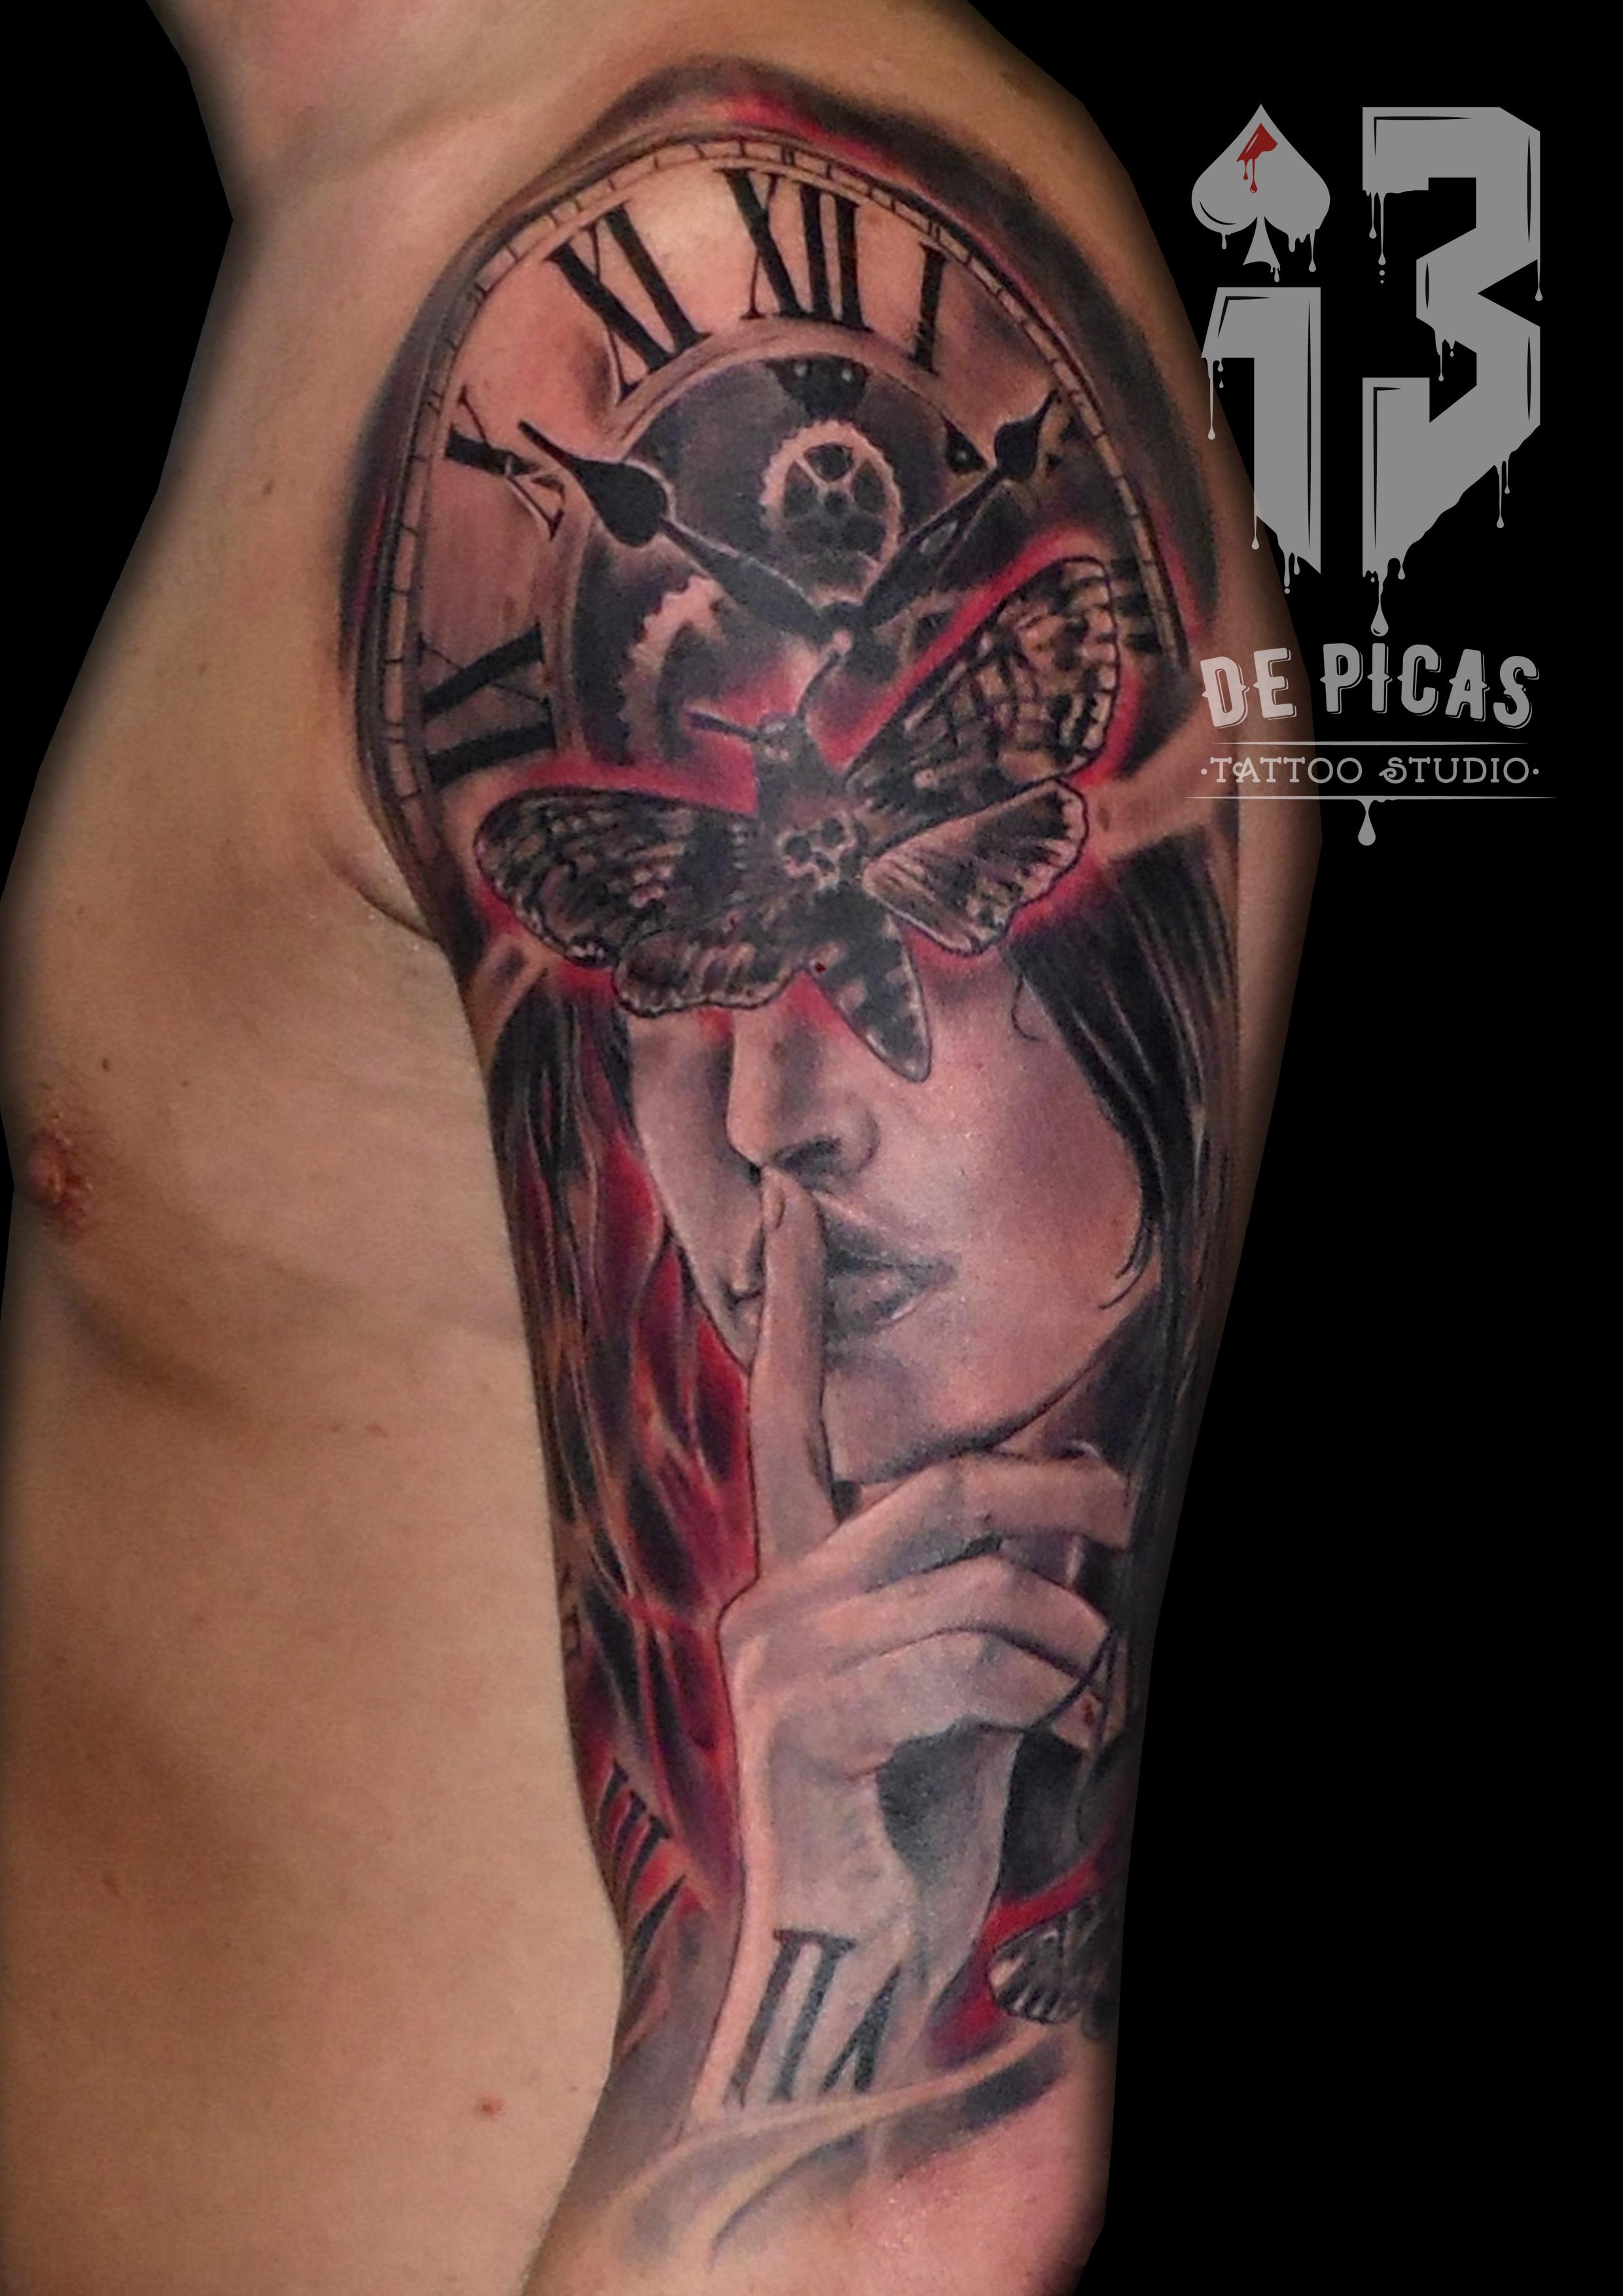 chica reloj silencio tattoo tatuajes jaca huesca spain polilla realista brazo hombro